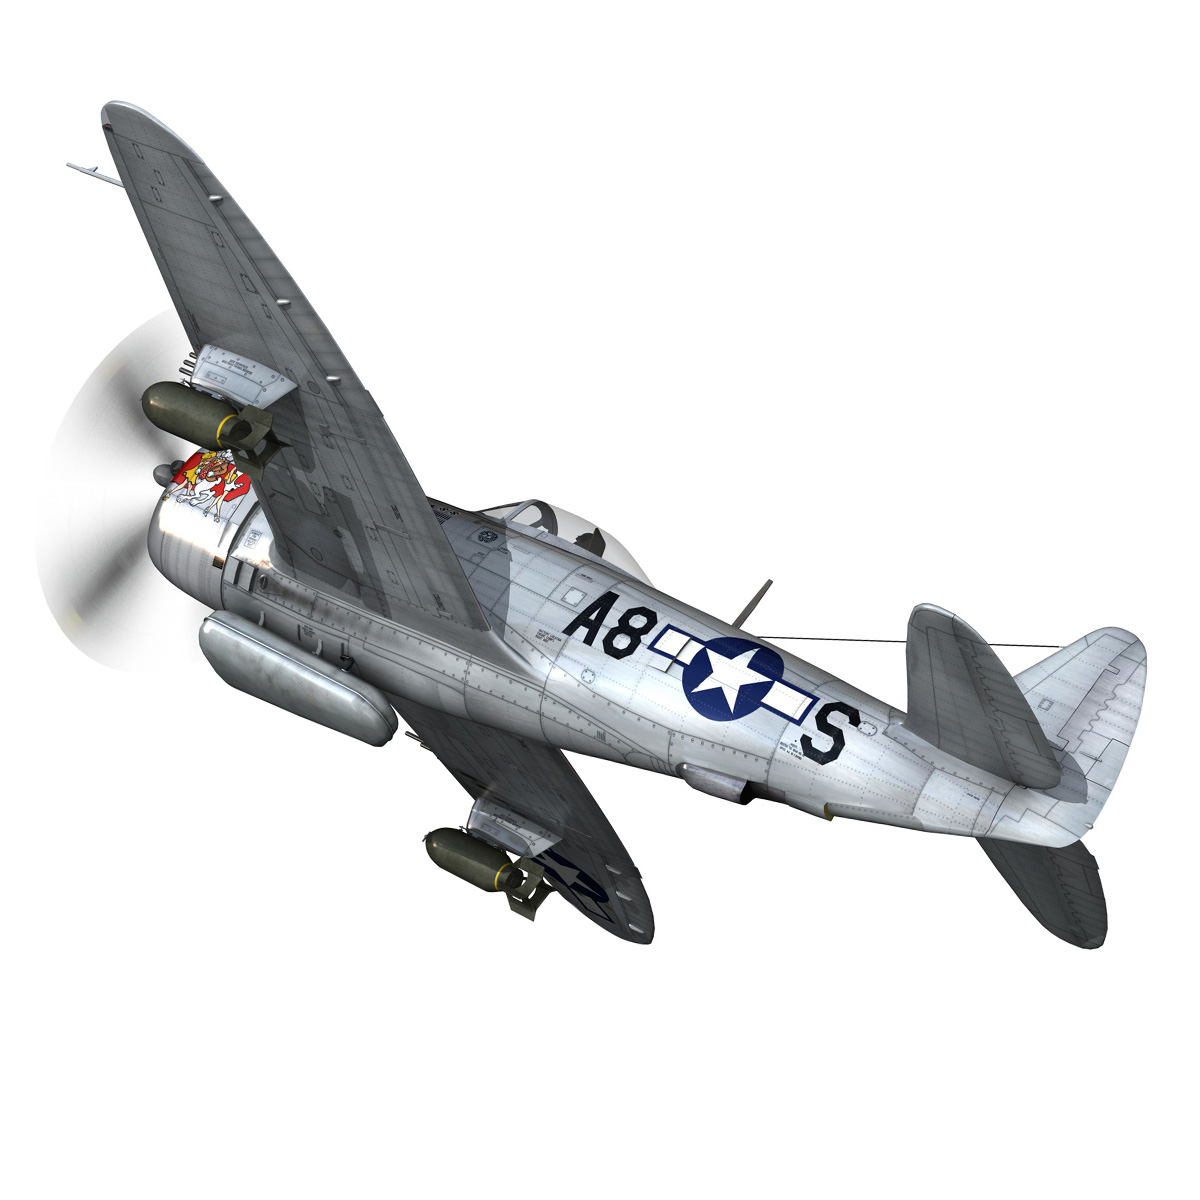 republic p-47 thunderbolt – daddy rabbit 3d model fbx c4d lwo obj 272692